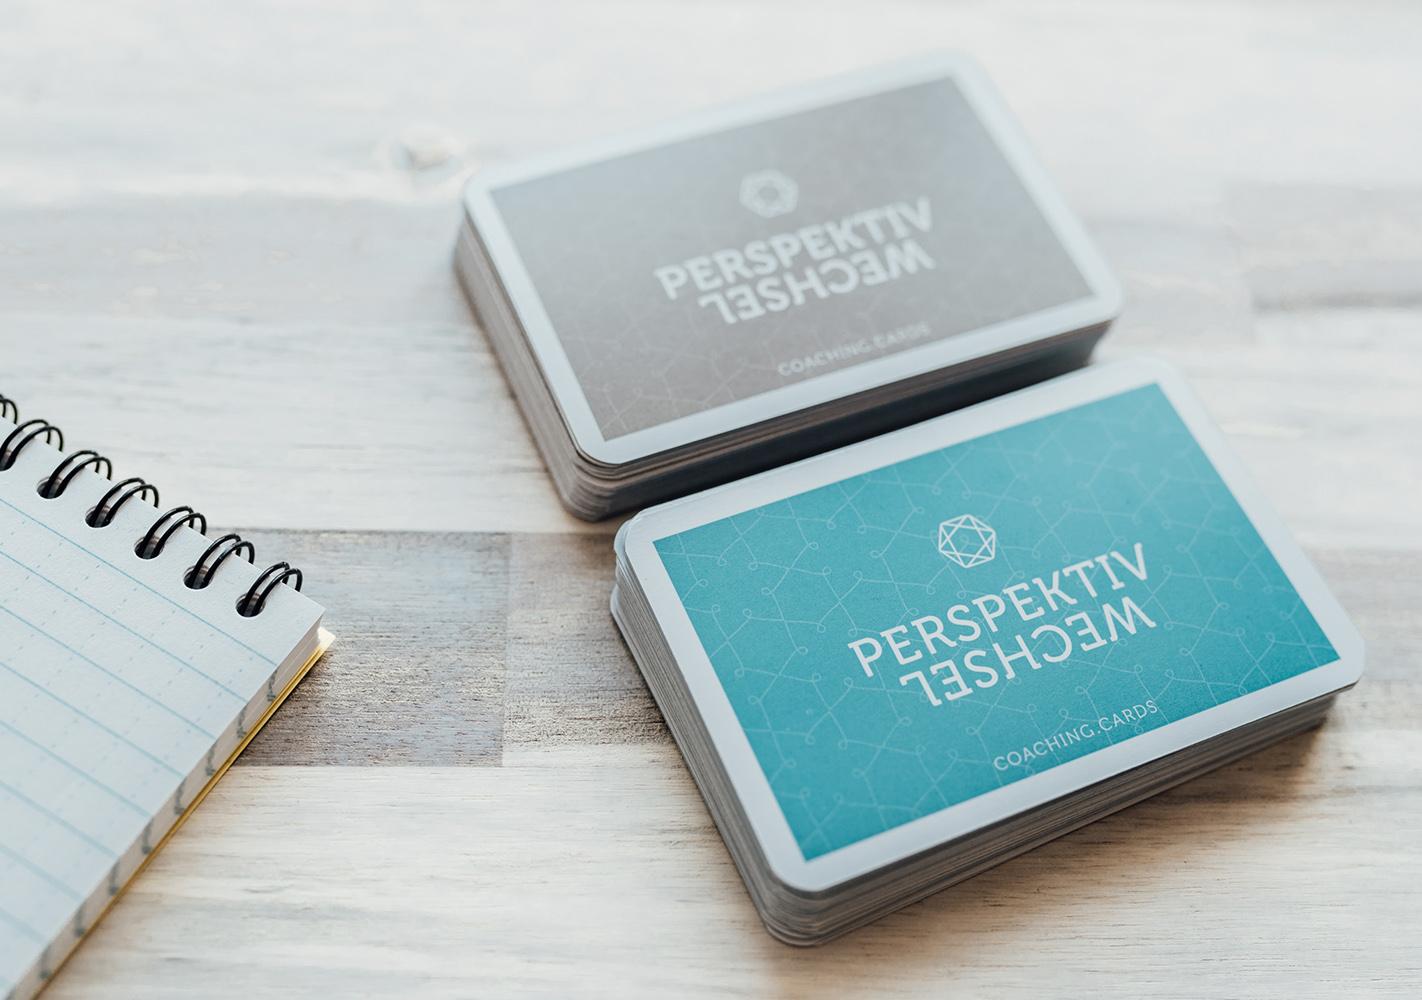 PerspektivWechsel, Kartensets,